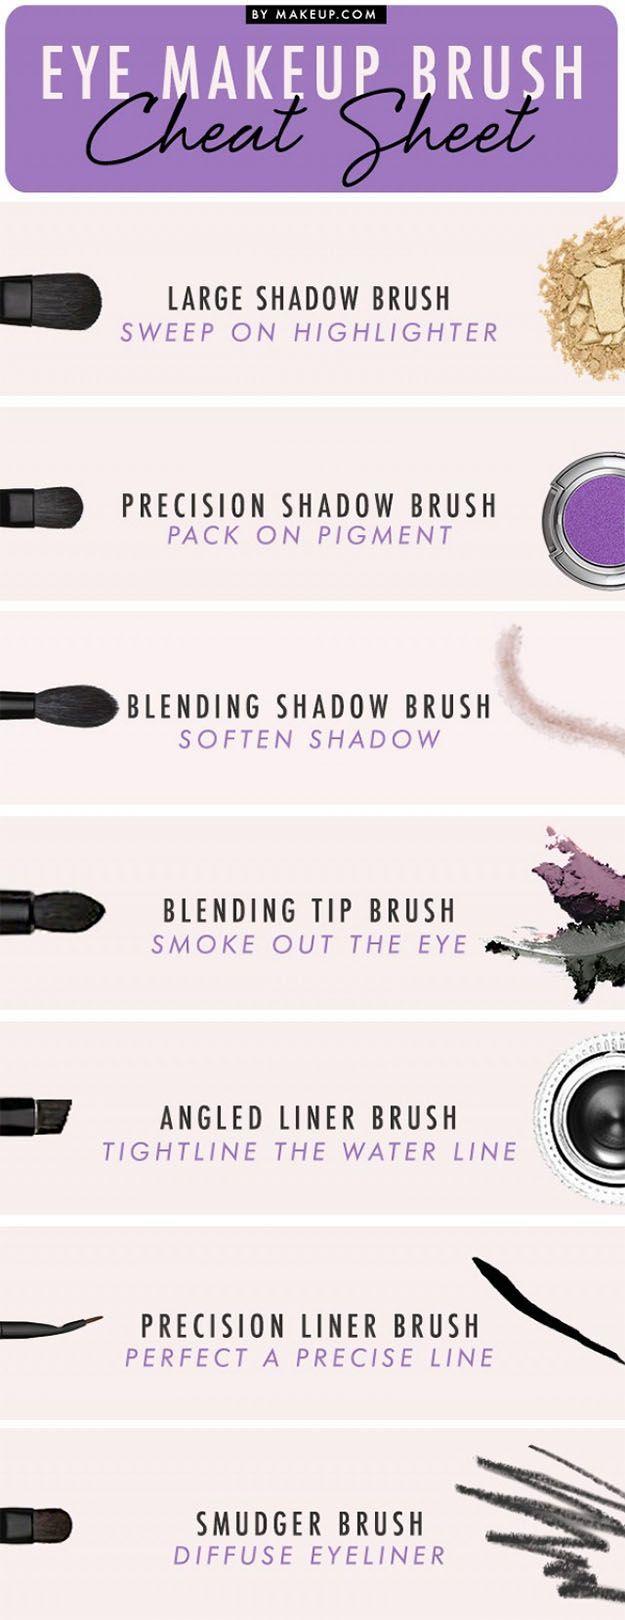 Eye Makeup Brush Cheat Sheet, check it out at makeuptutorials.c...